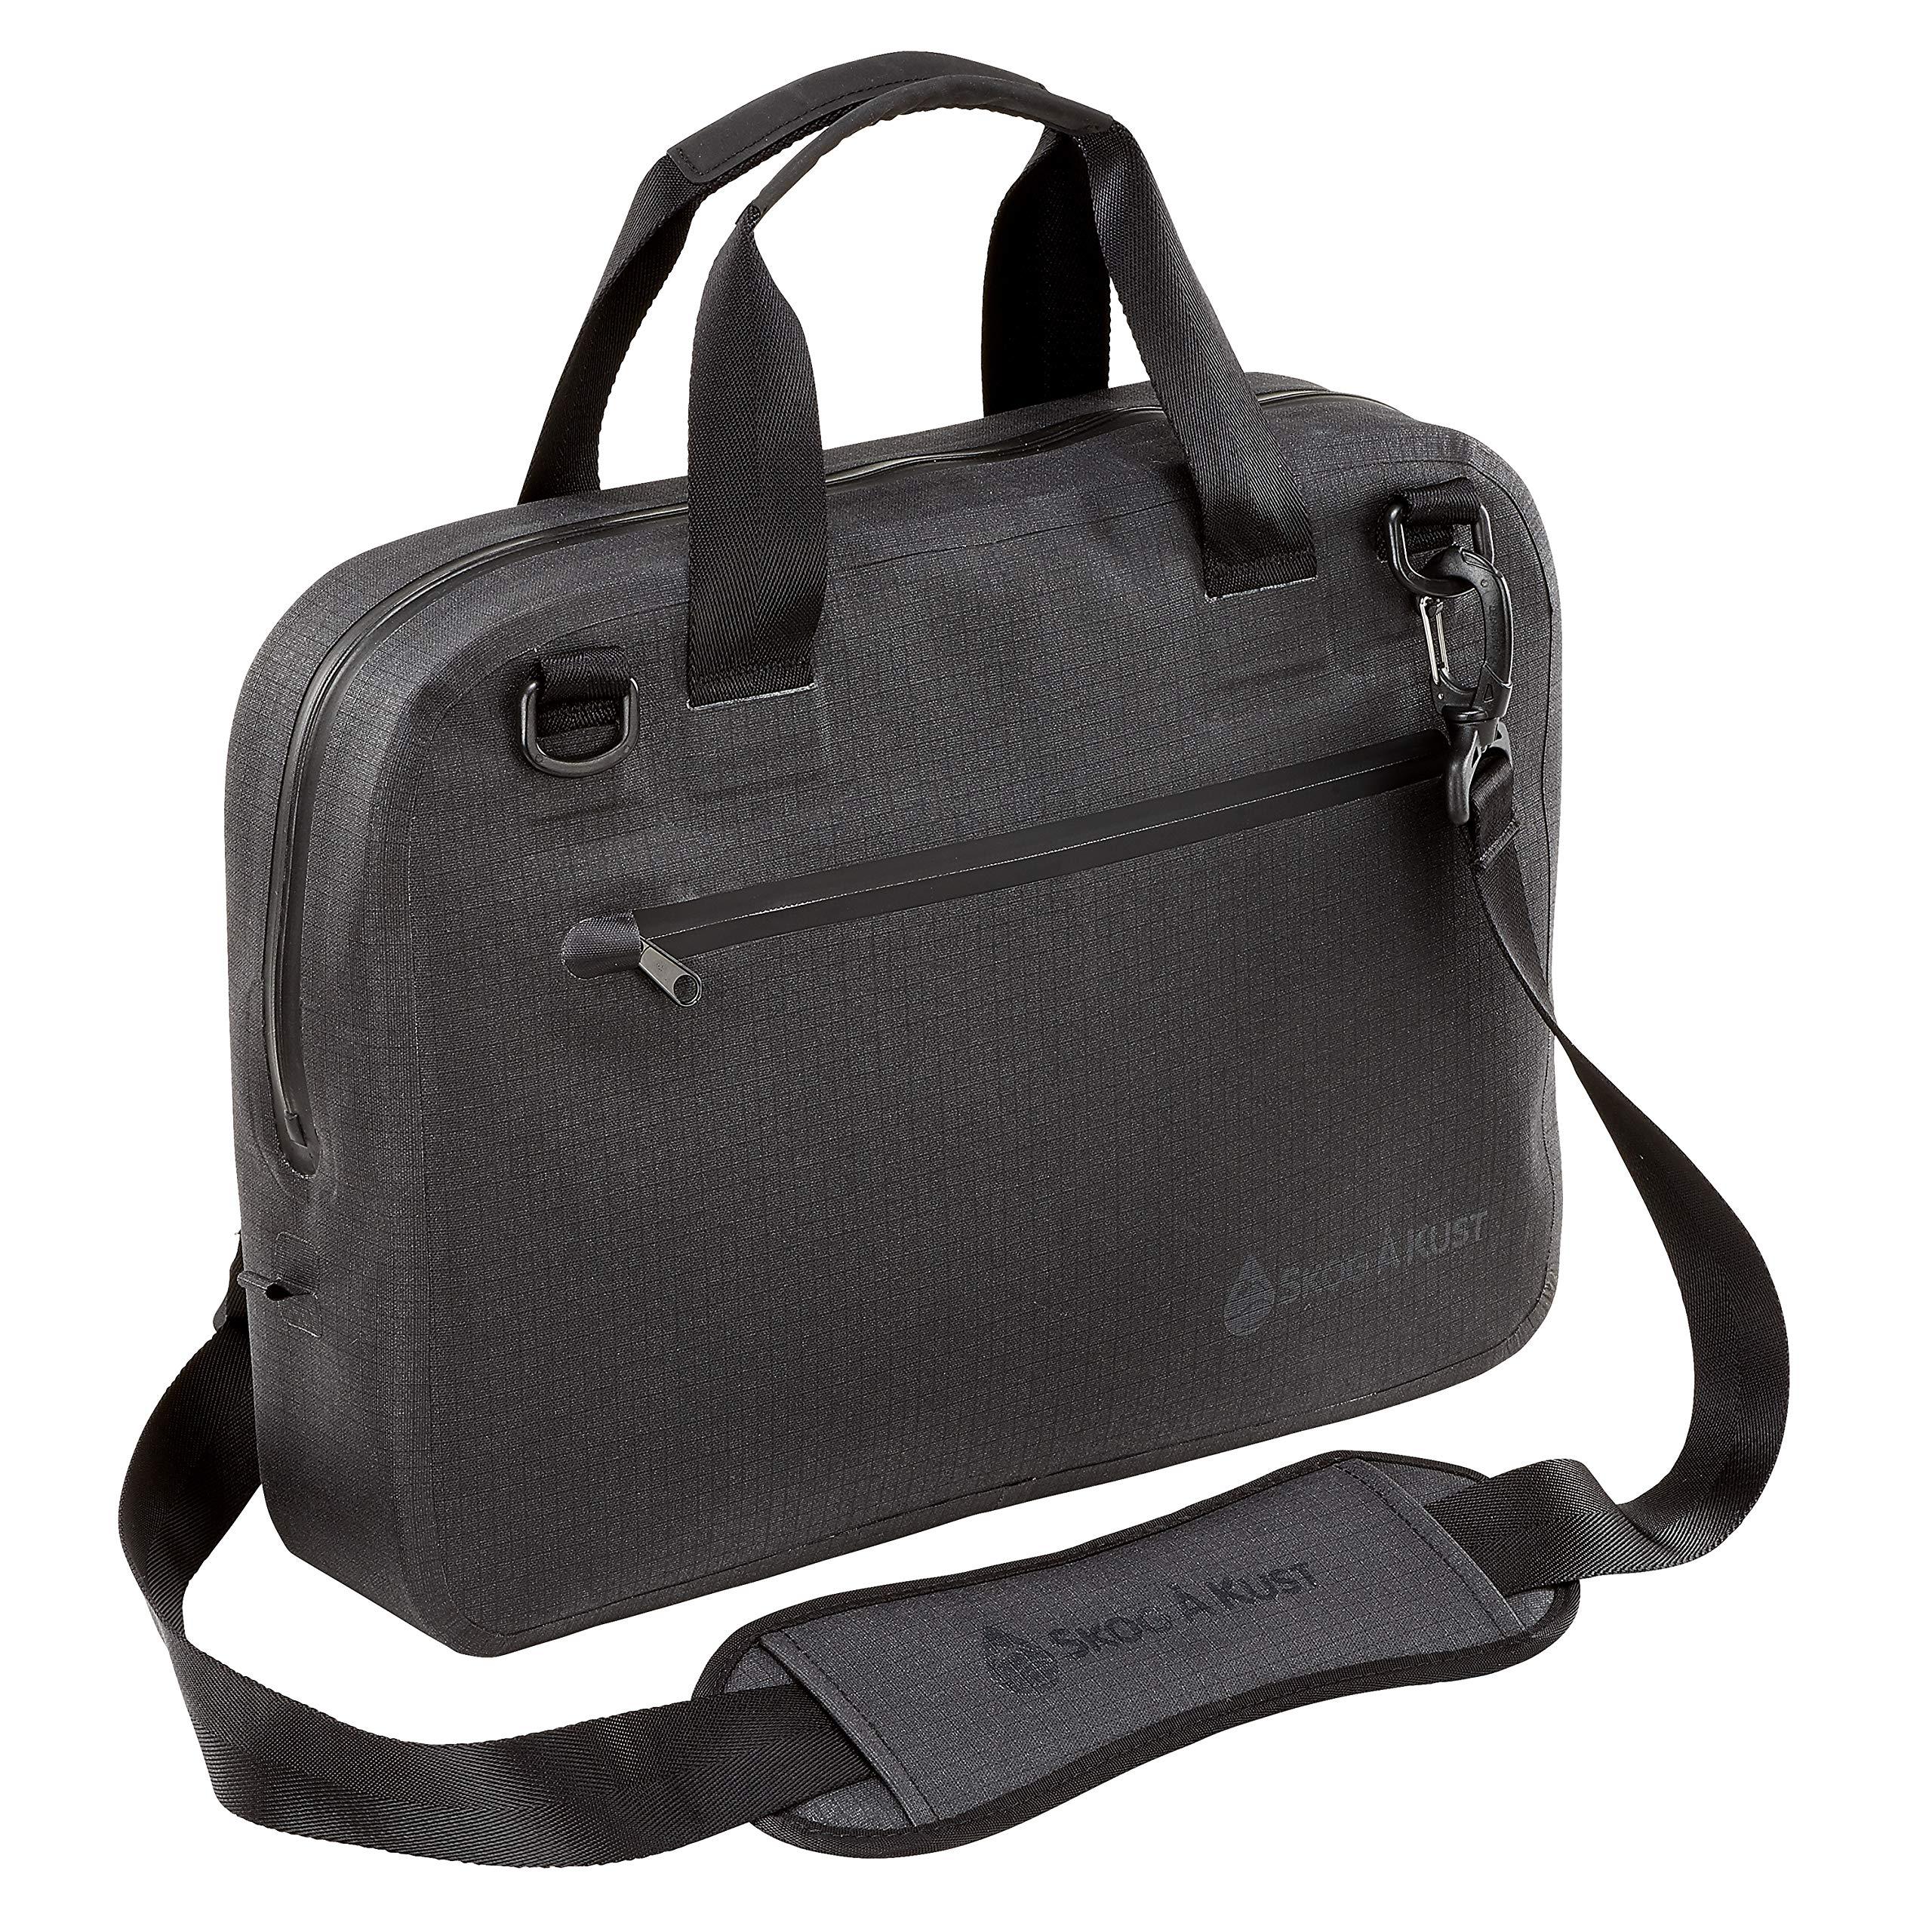 Såk Gear BriefSåk Pro 100% Waterproof & Airtight Messenger Bag   Black, 15''